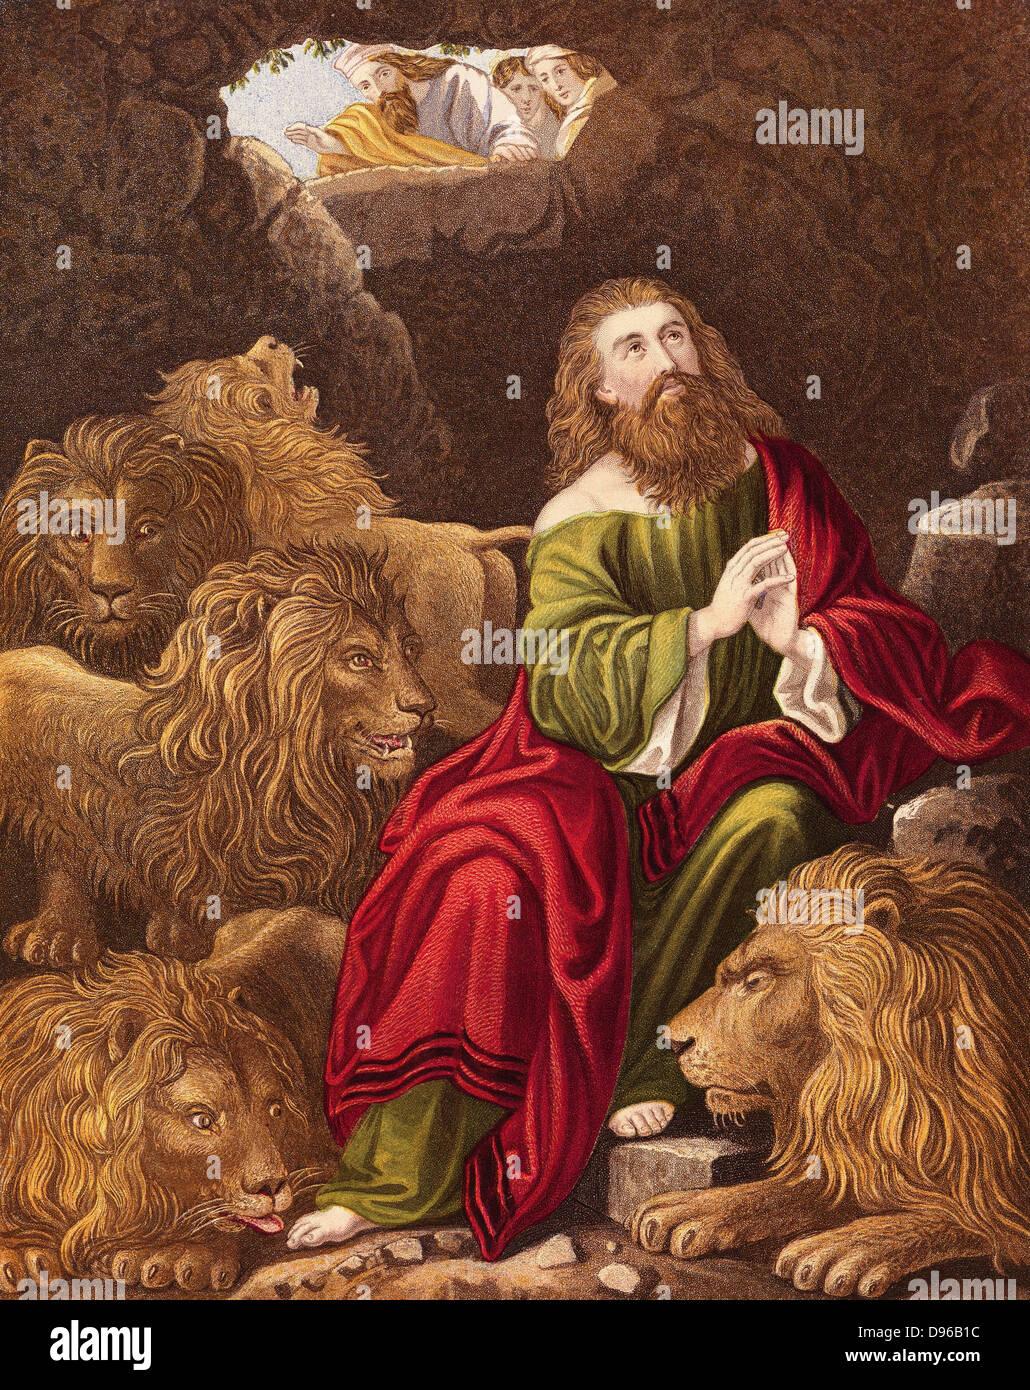 Daniel, one of four great Hebrew prophets, l cast into the Lions' den by Nebuchadnezzar (Nebuchadrezzar) king - Stock Image